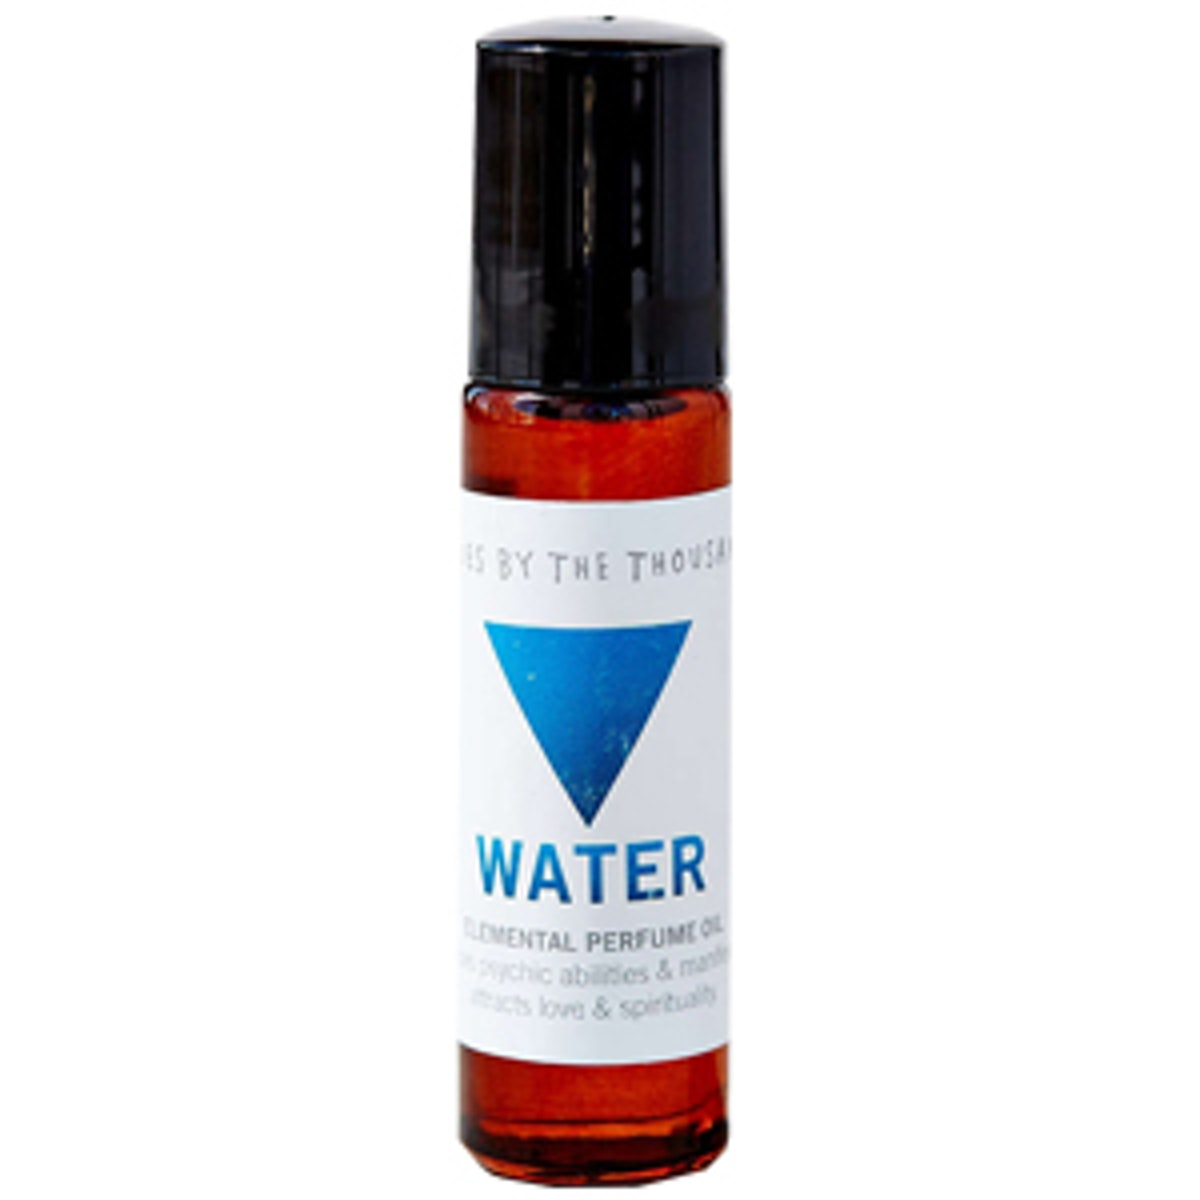 Perfume Oil in Water